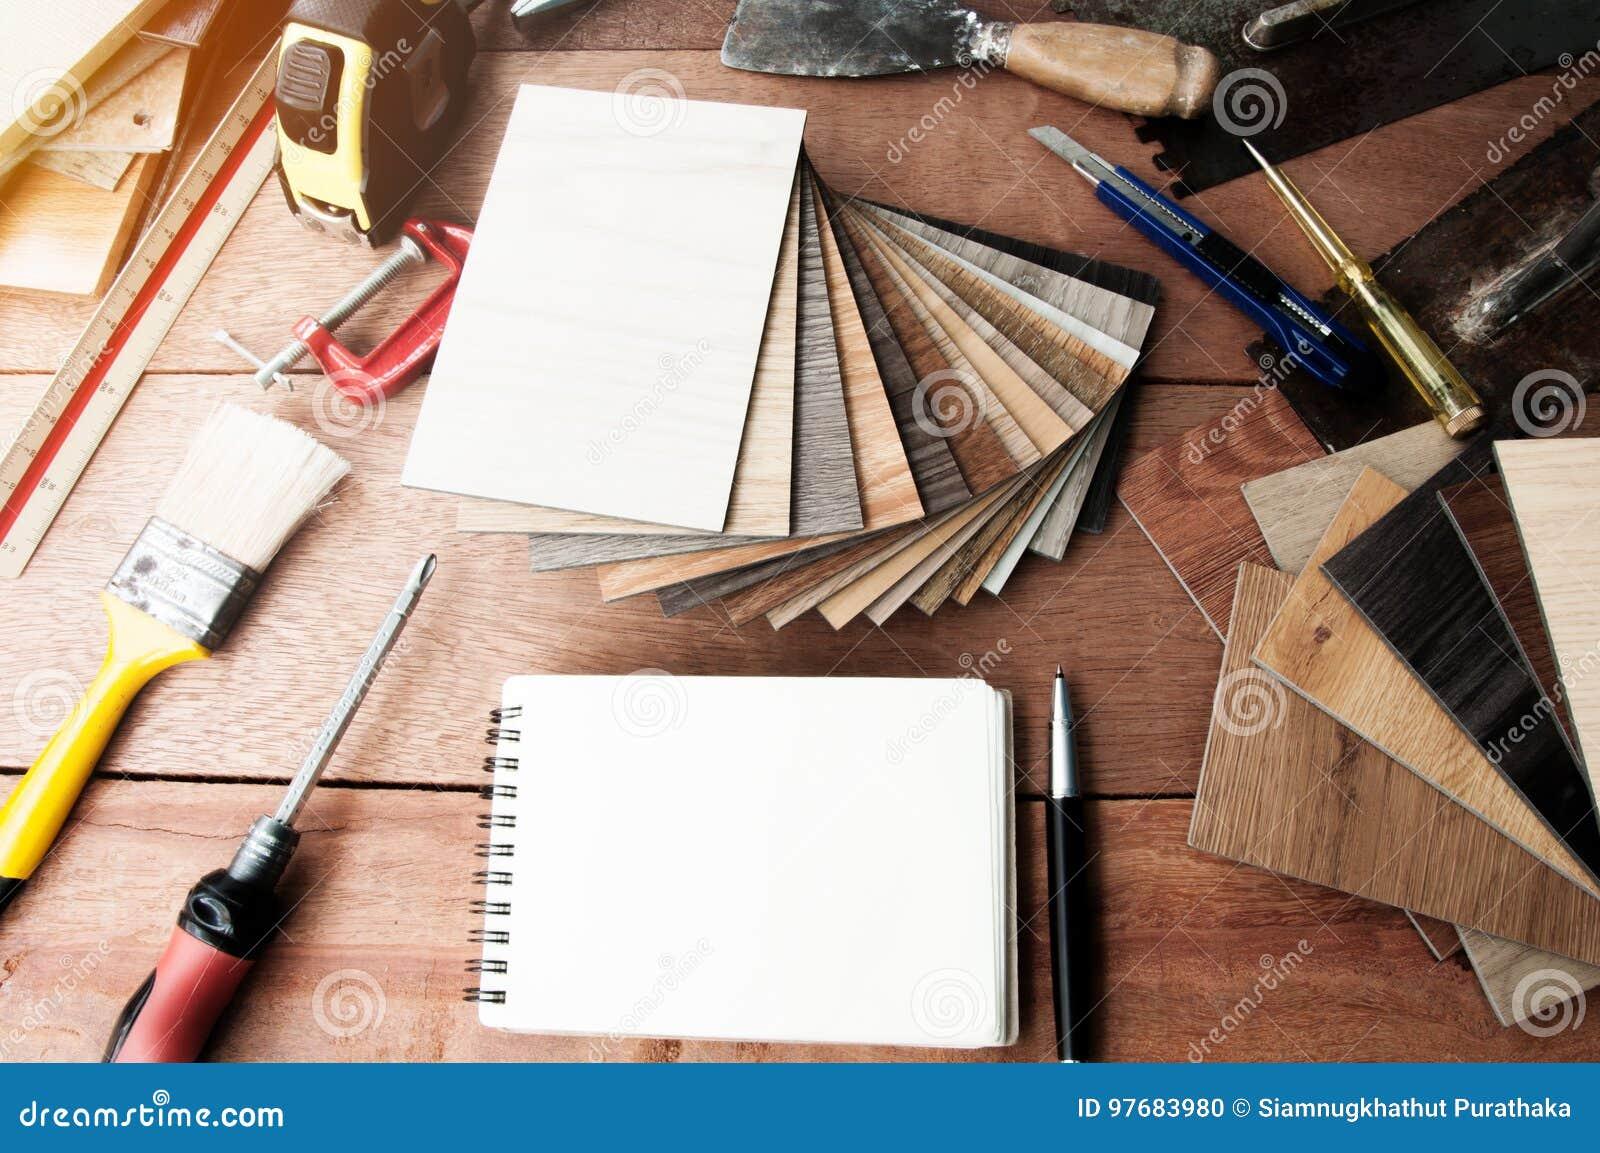 Decorative House, Paintbrushes, Interior Design Stock Photo - Image of  decorative, construction: 97683980